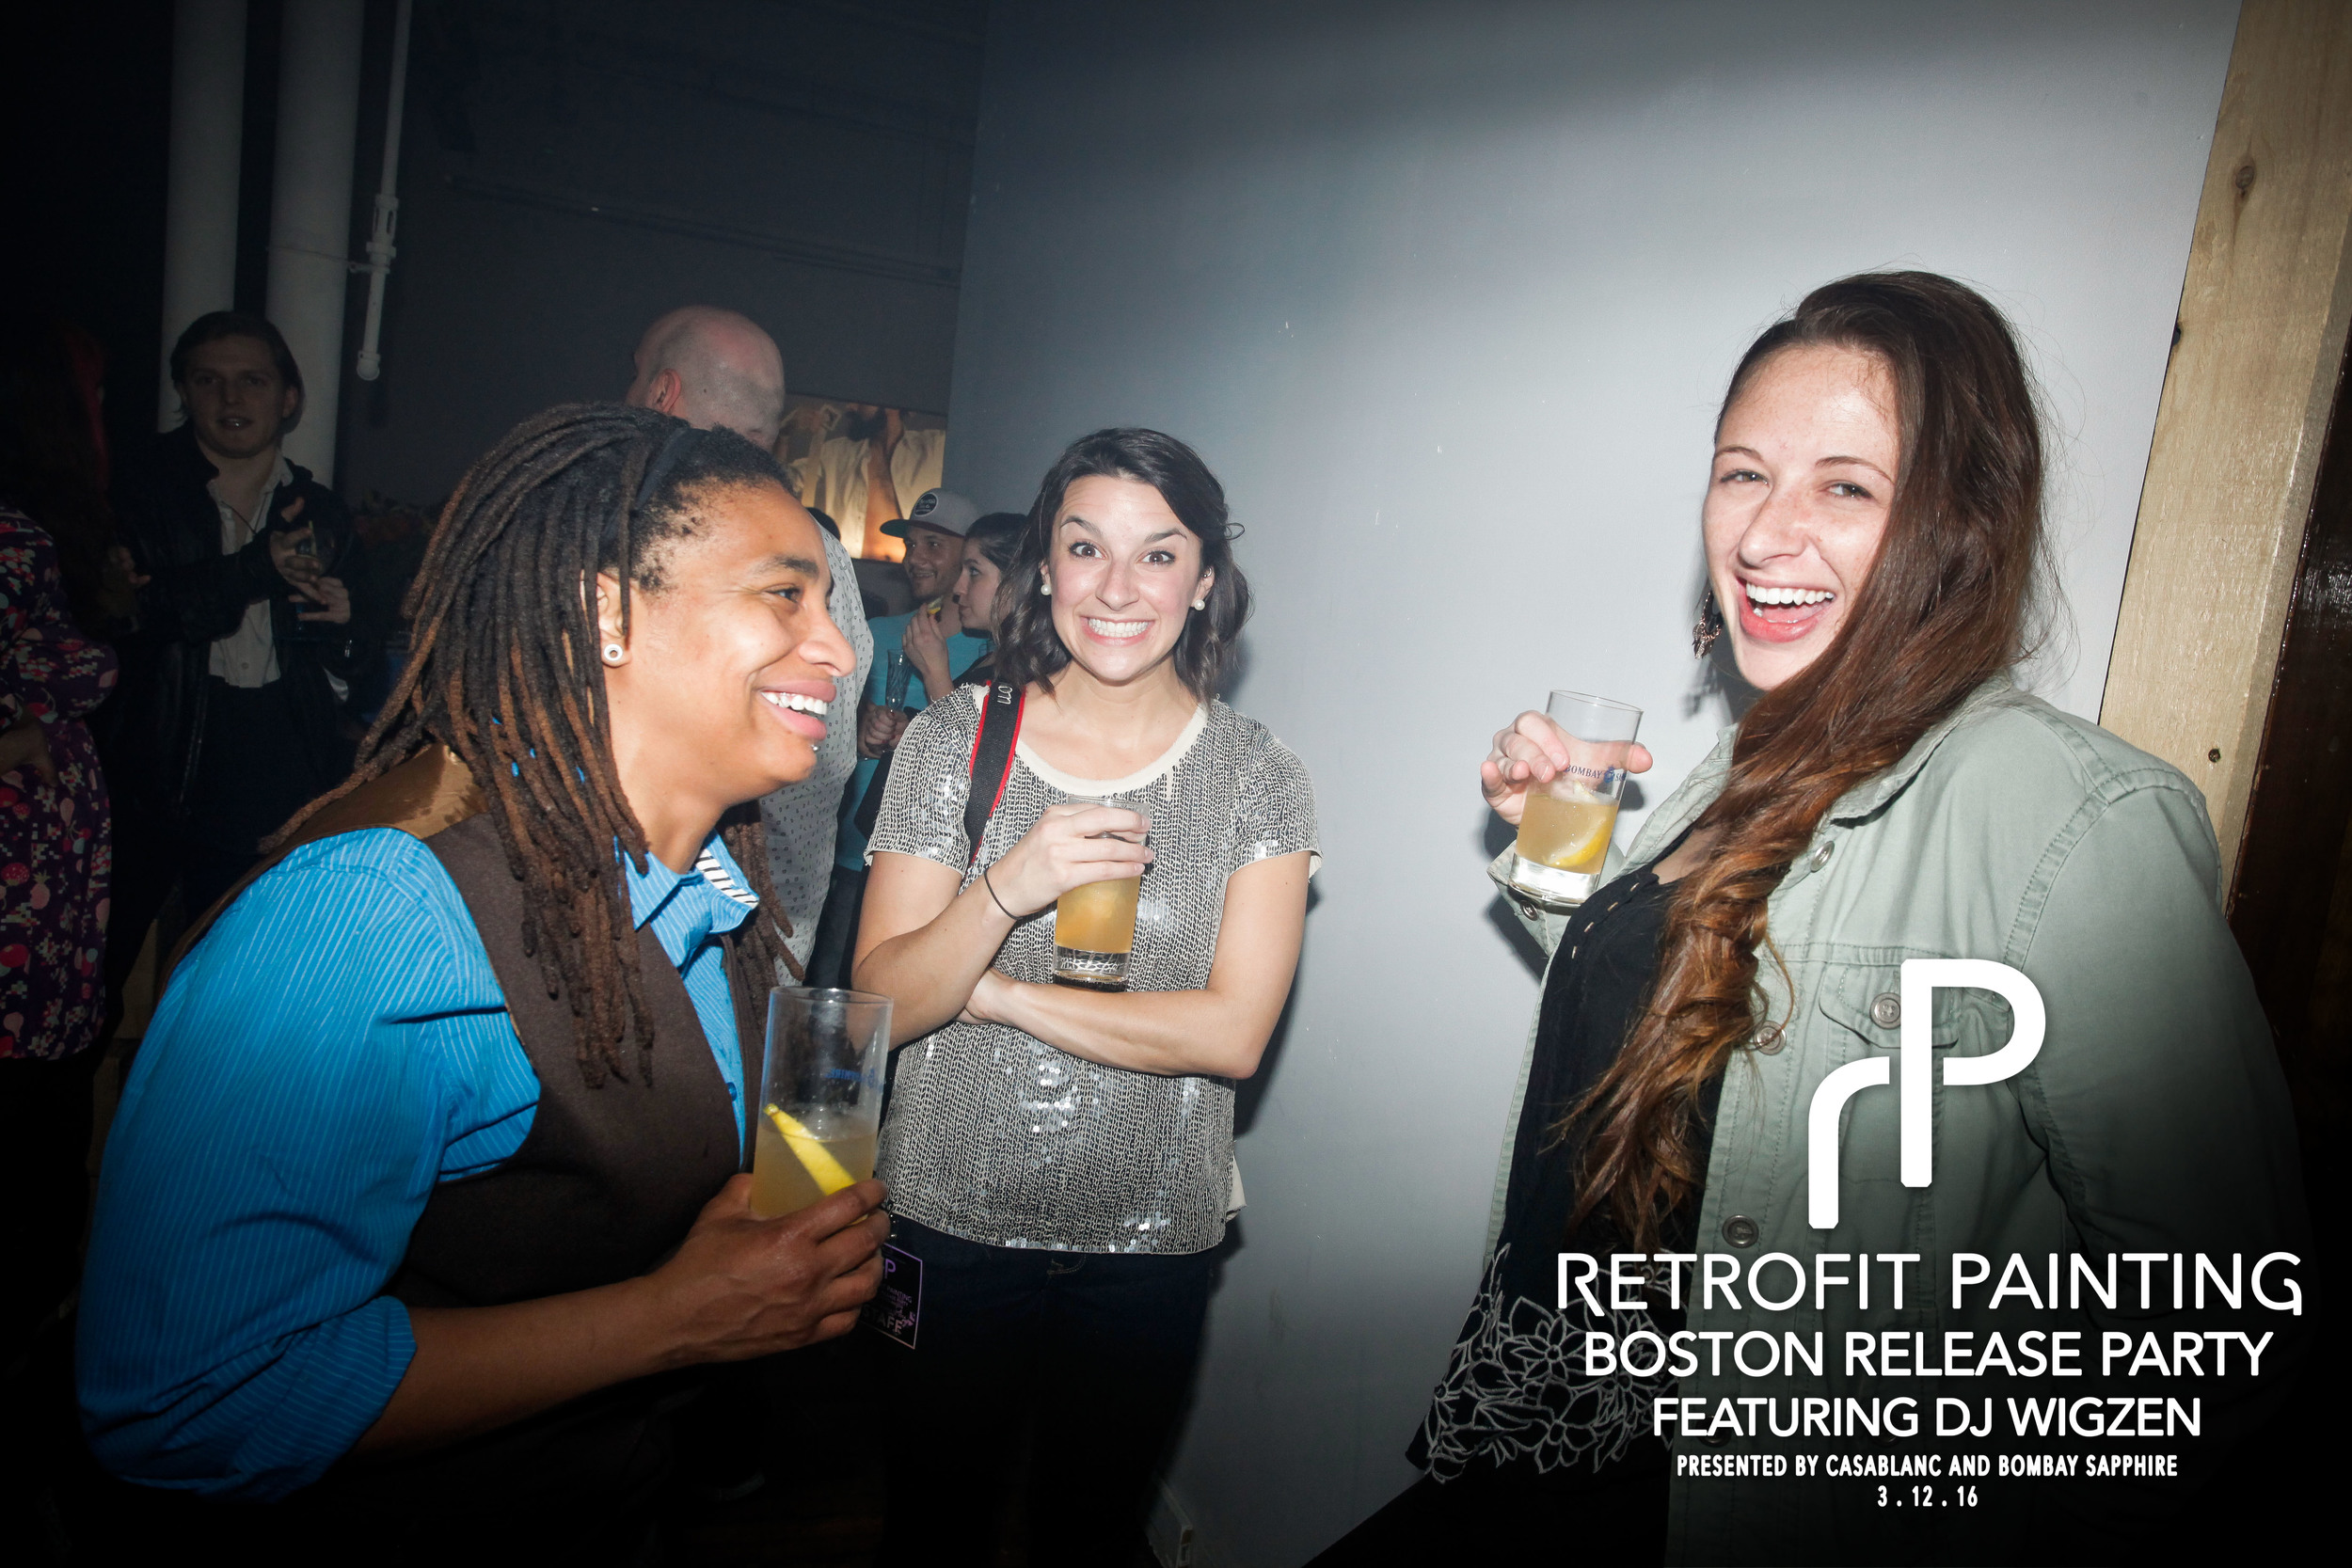 Retrofit Painting Boston Release Party 0161.jpg